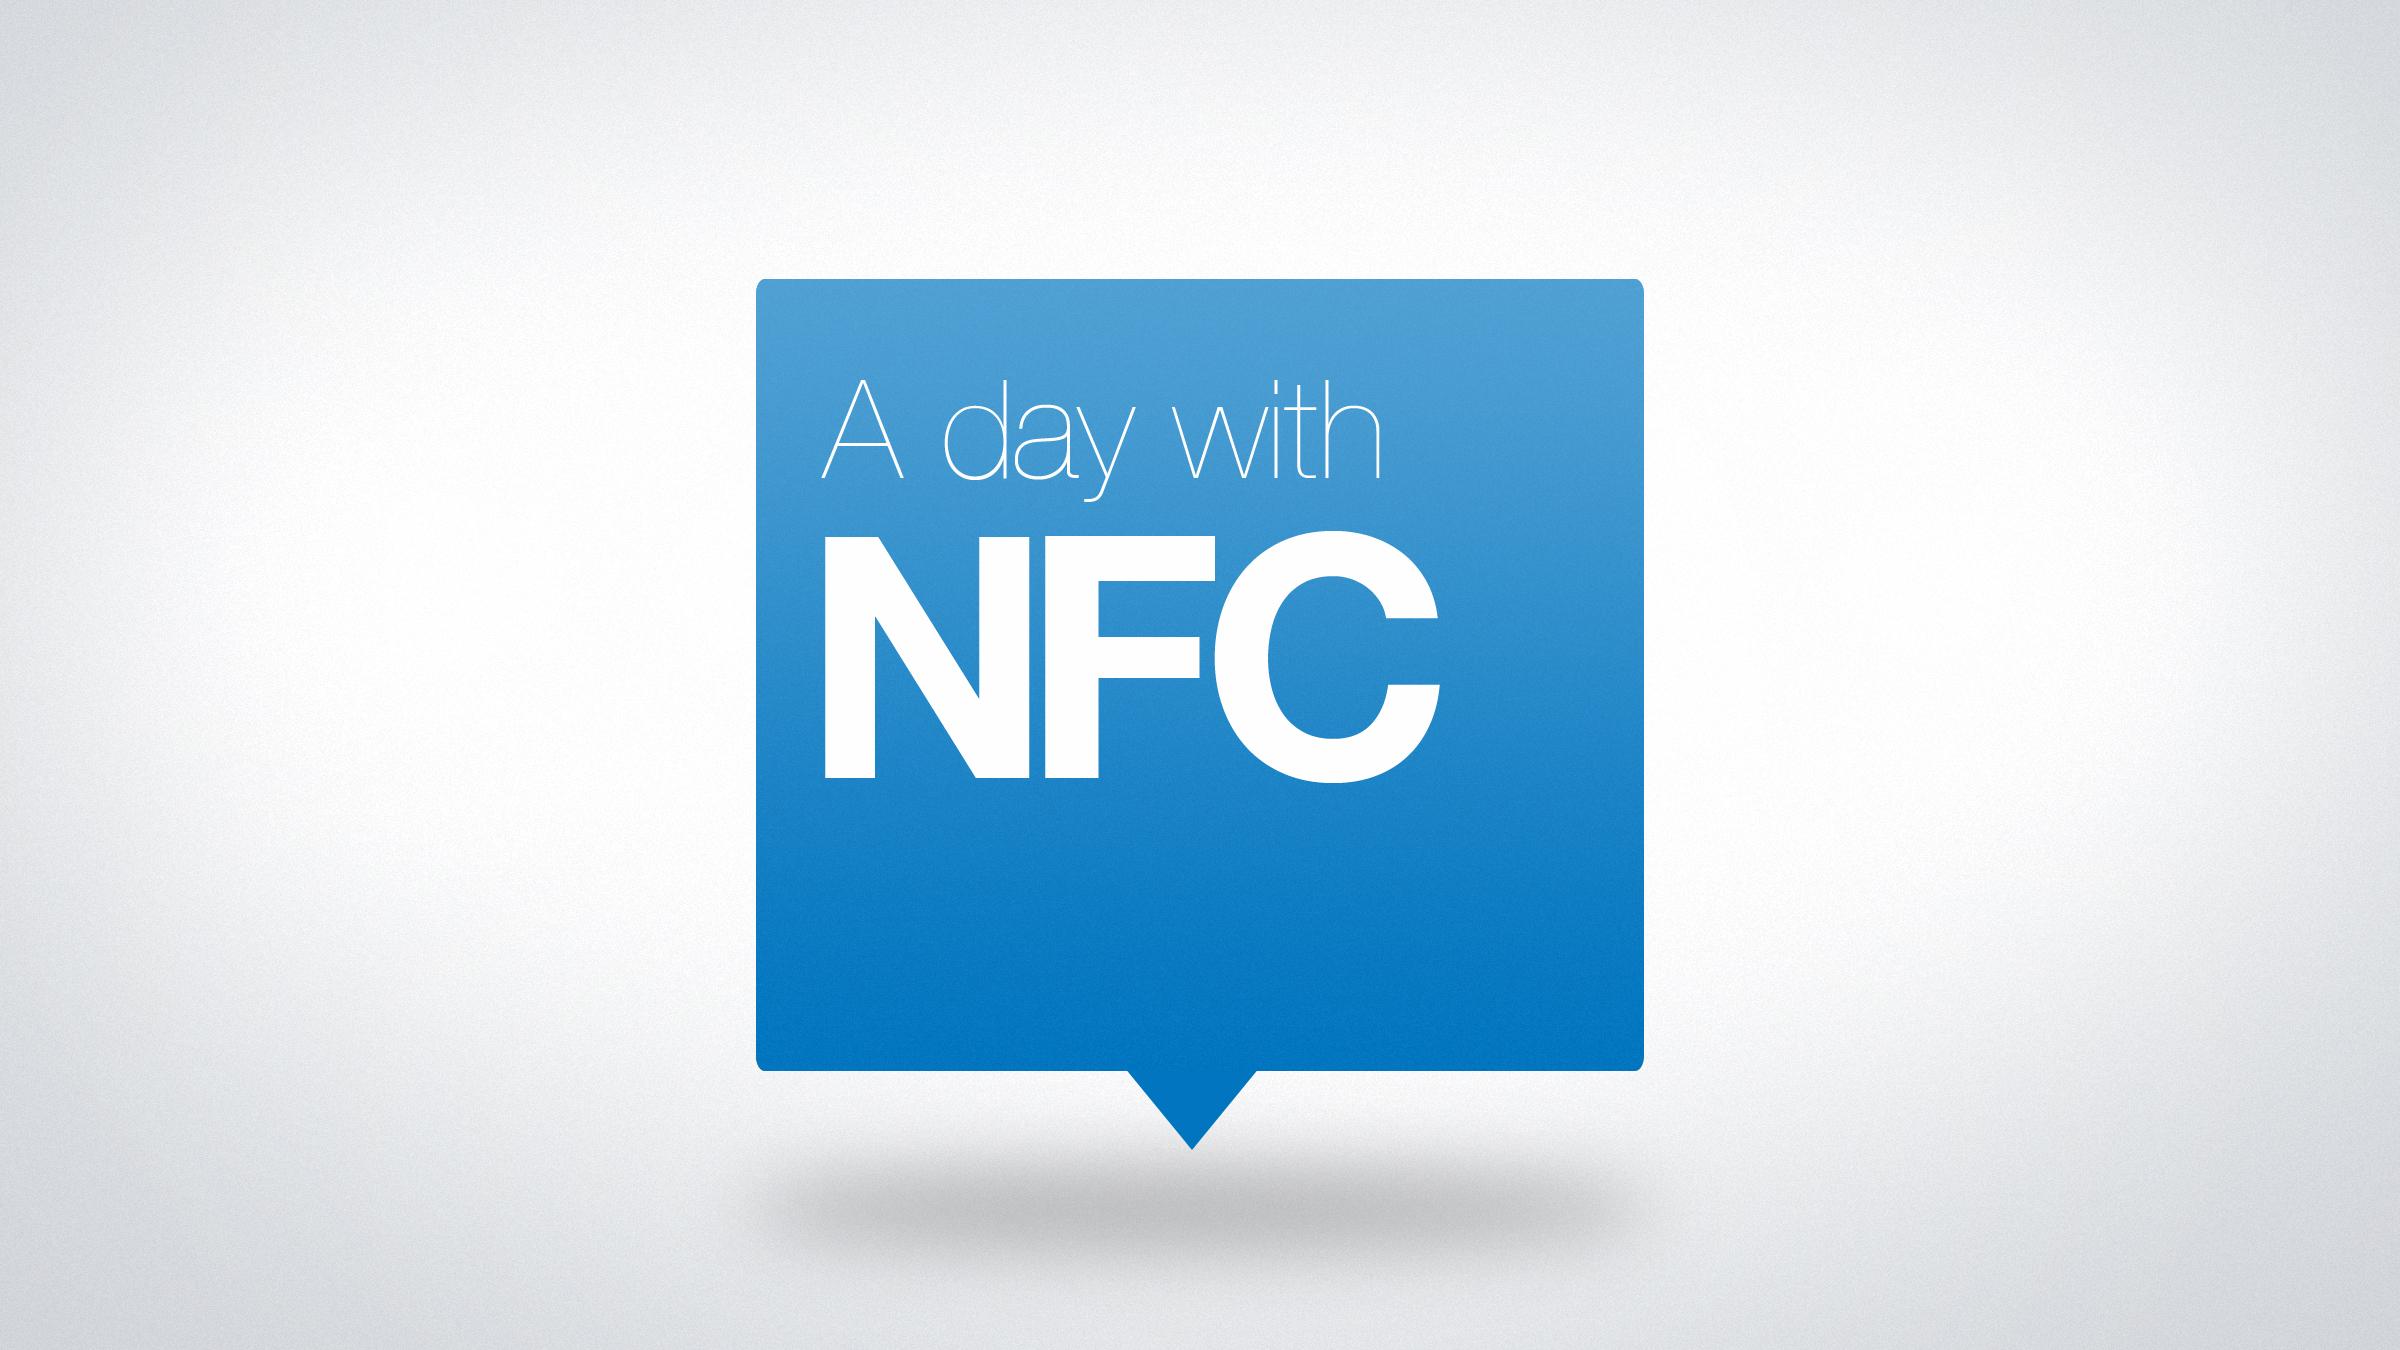 NFC_0001_Layer Comp 3.jpg